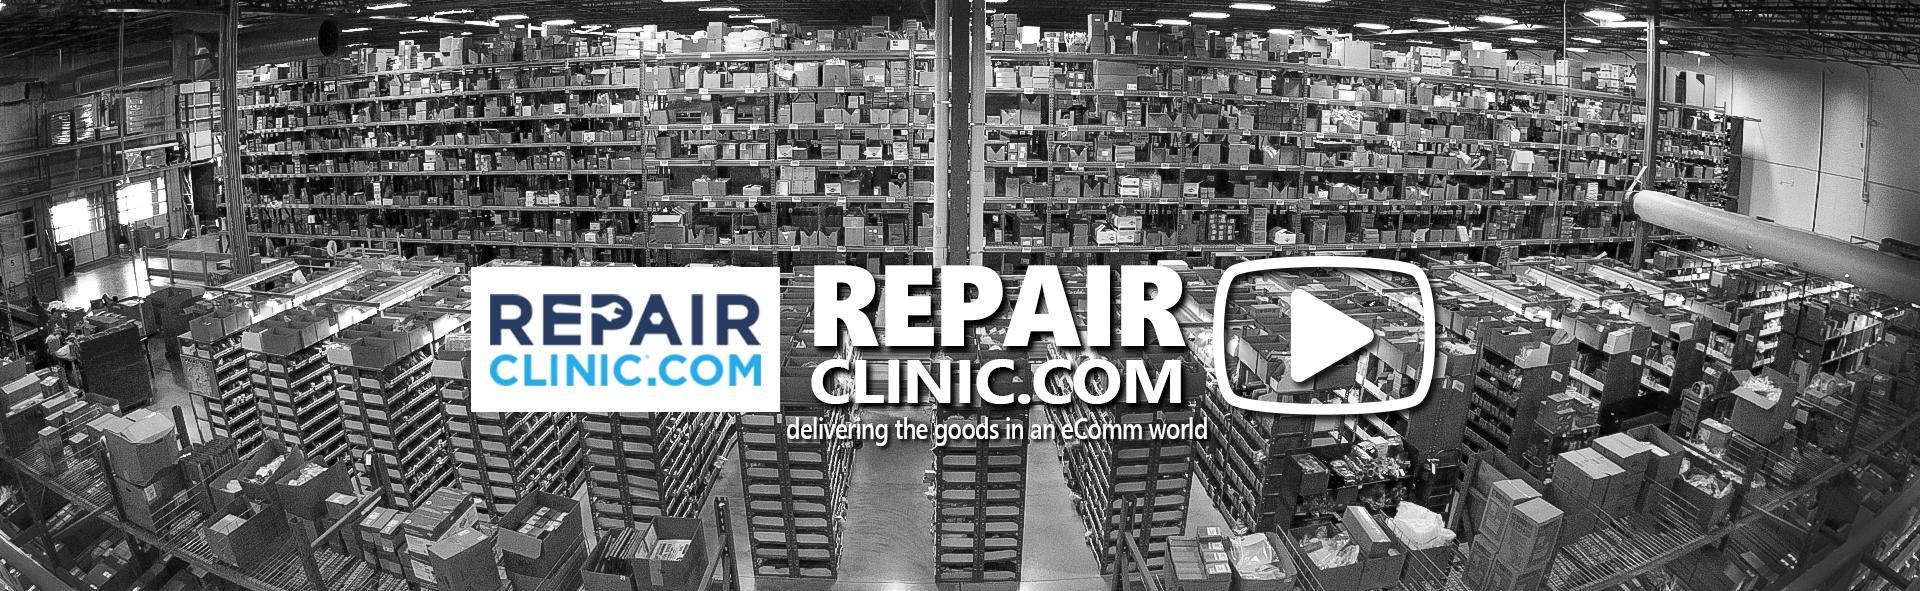 repairclinic video